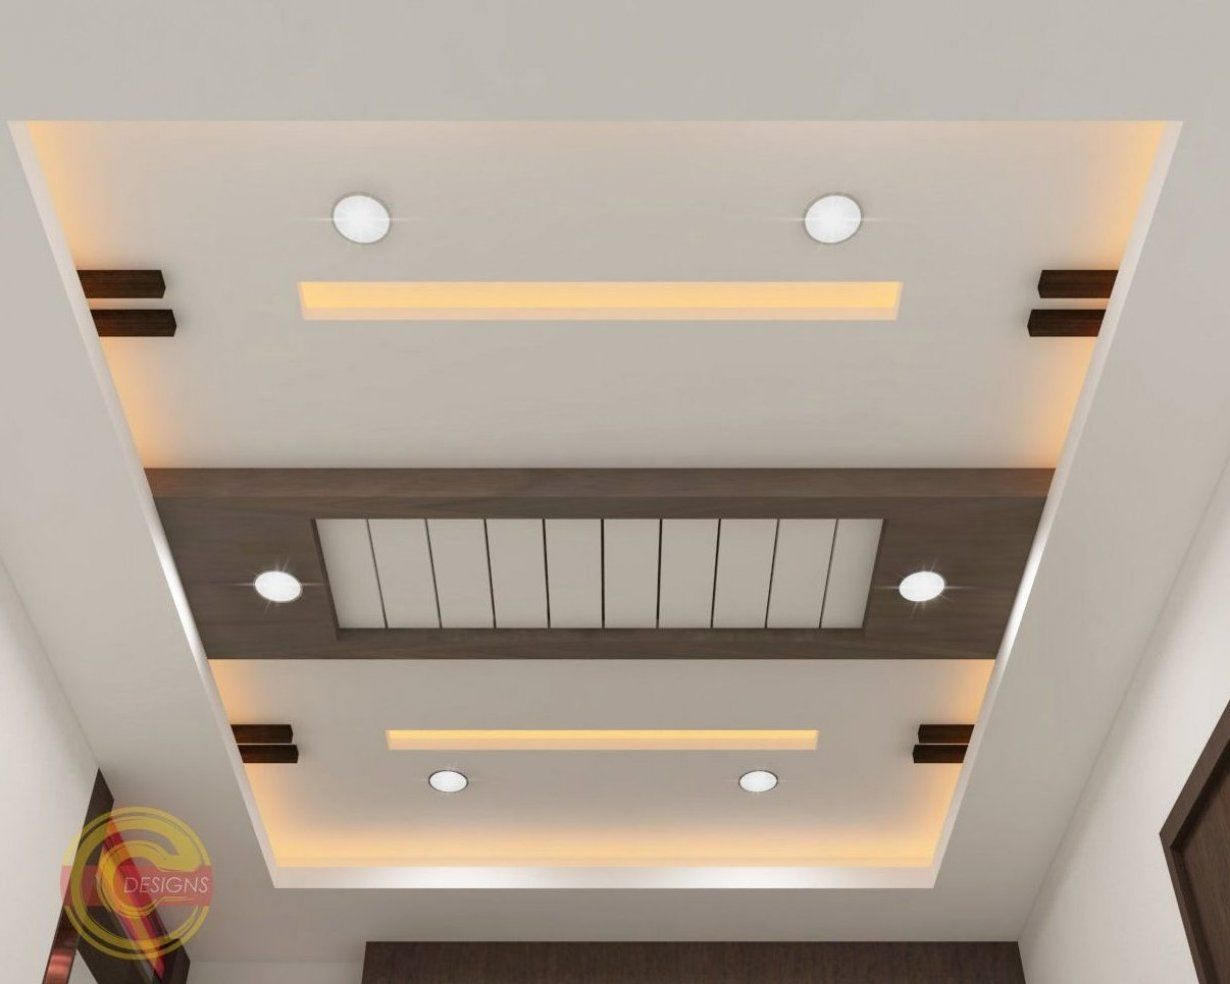 Fall Ceiling Designs Concepts 3d Concepts Livingroomdecor Homedecorideas Hom Kitchen Ceiling Design Ceiling Design Living Room Simple False Ceiling Design